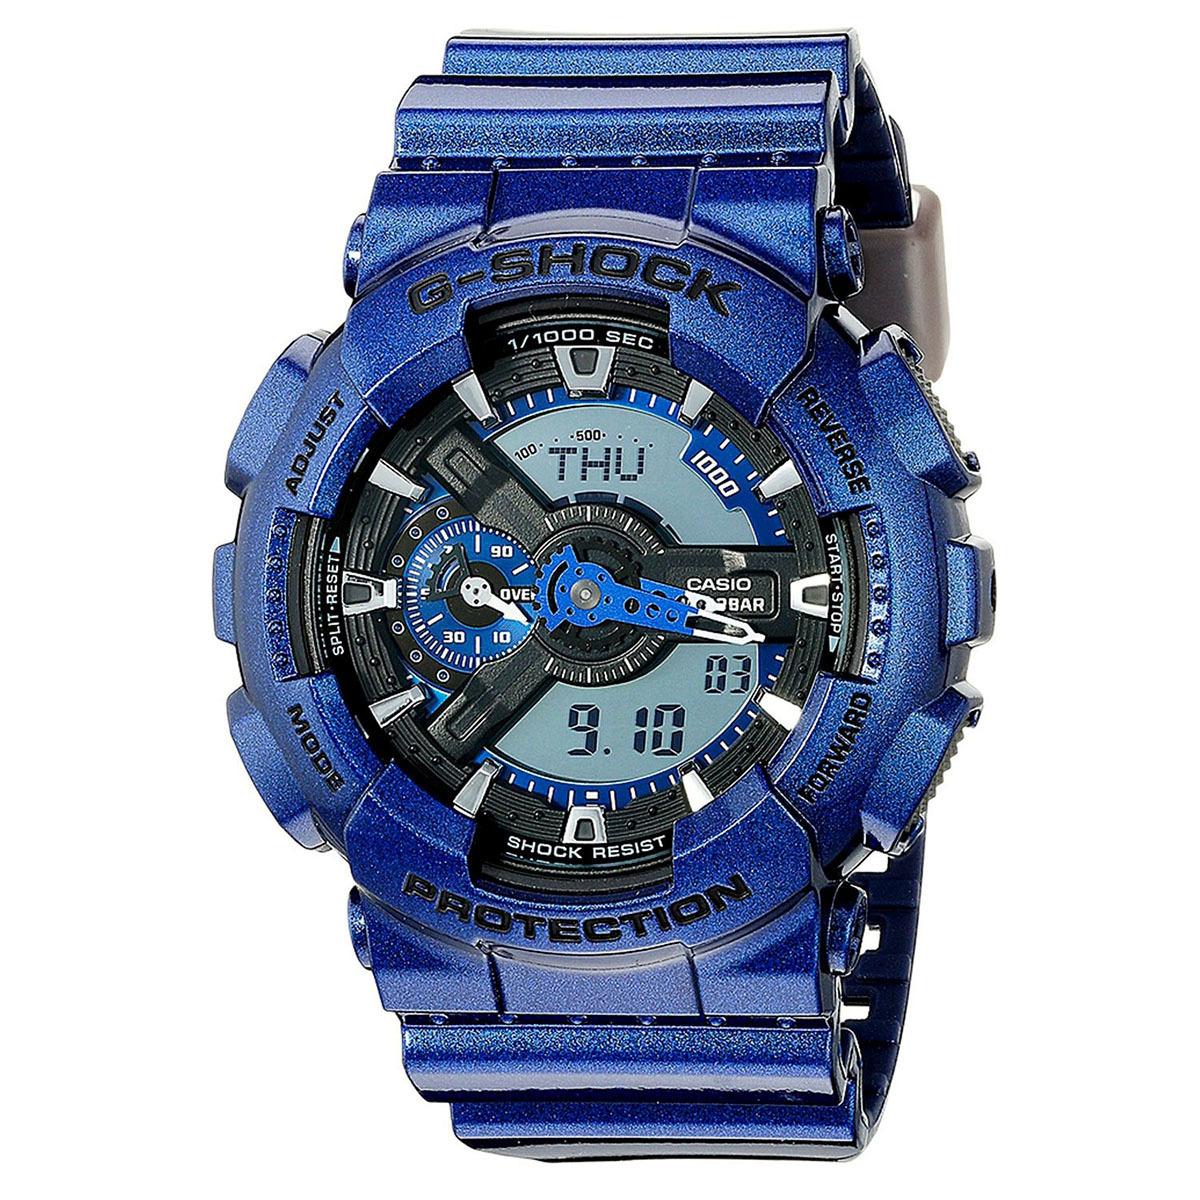 Qoo10 Casio Ga 110nm 2a Watch Jewelry Ediface 303l Fit To Viewer